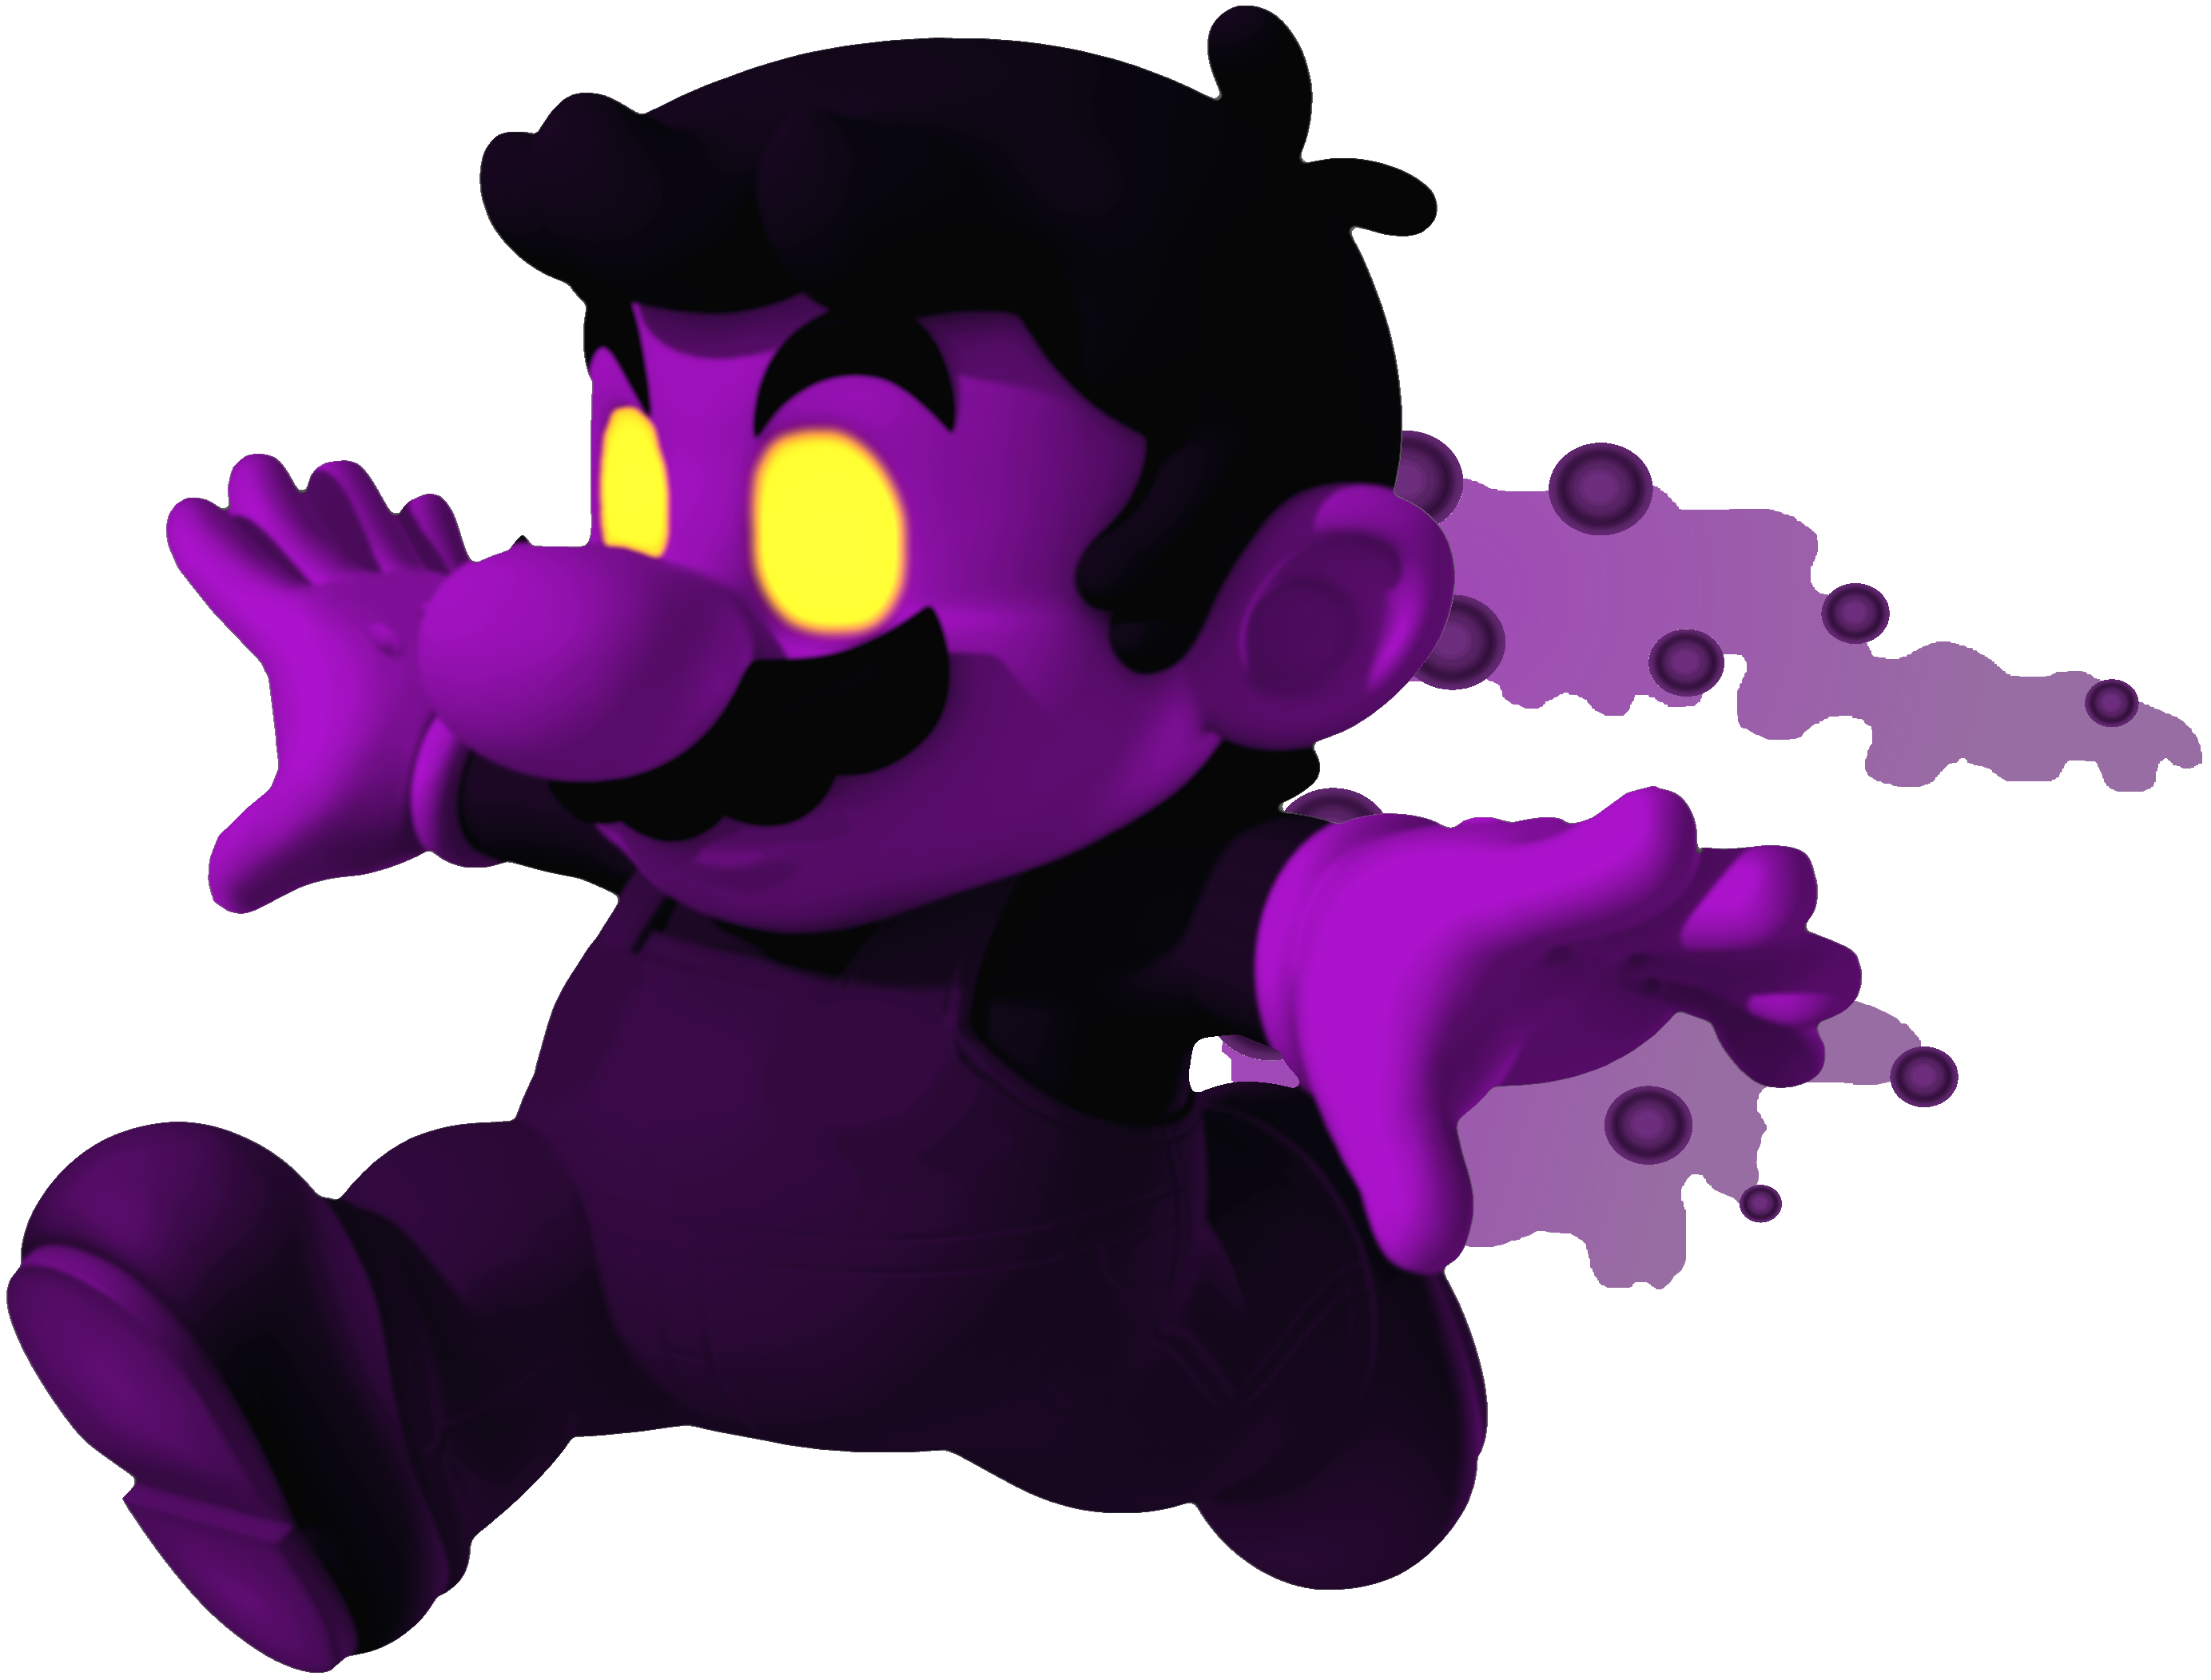 Galaxy clipart cosmic. Mario villains wiki fandom